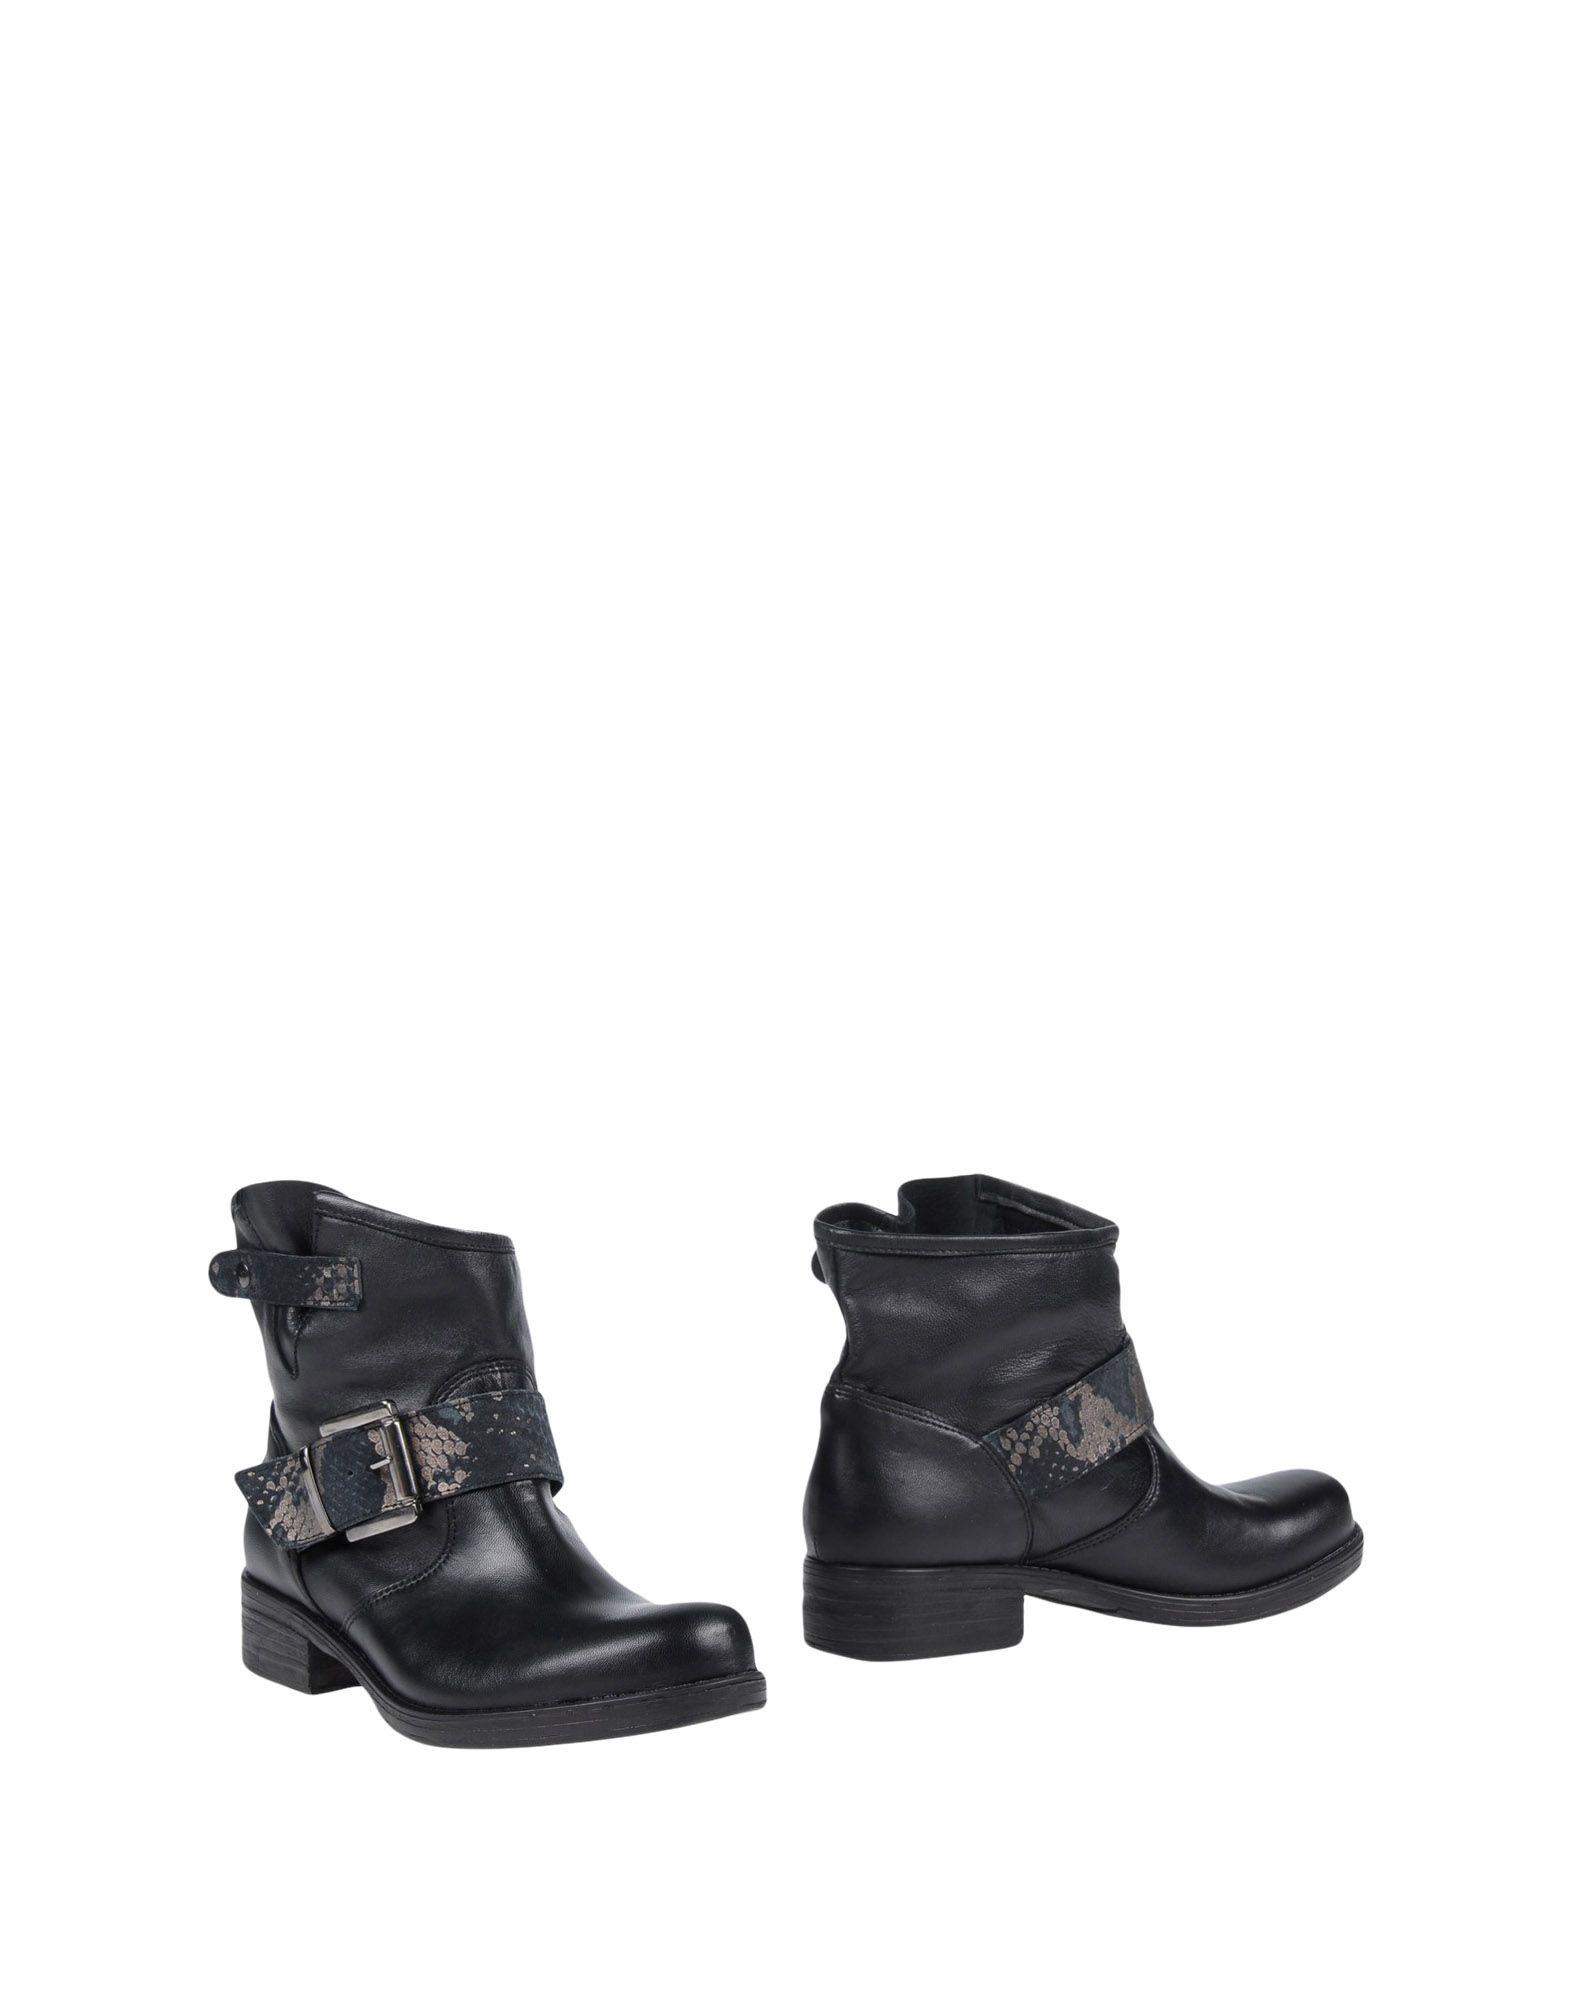 Tsd12 Gute Stiefelette Damen  11456371SP Gute Tsd12 Qualität beliebte Schuhe df5949